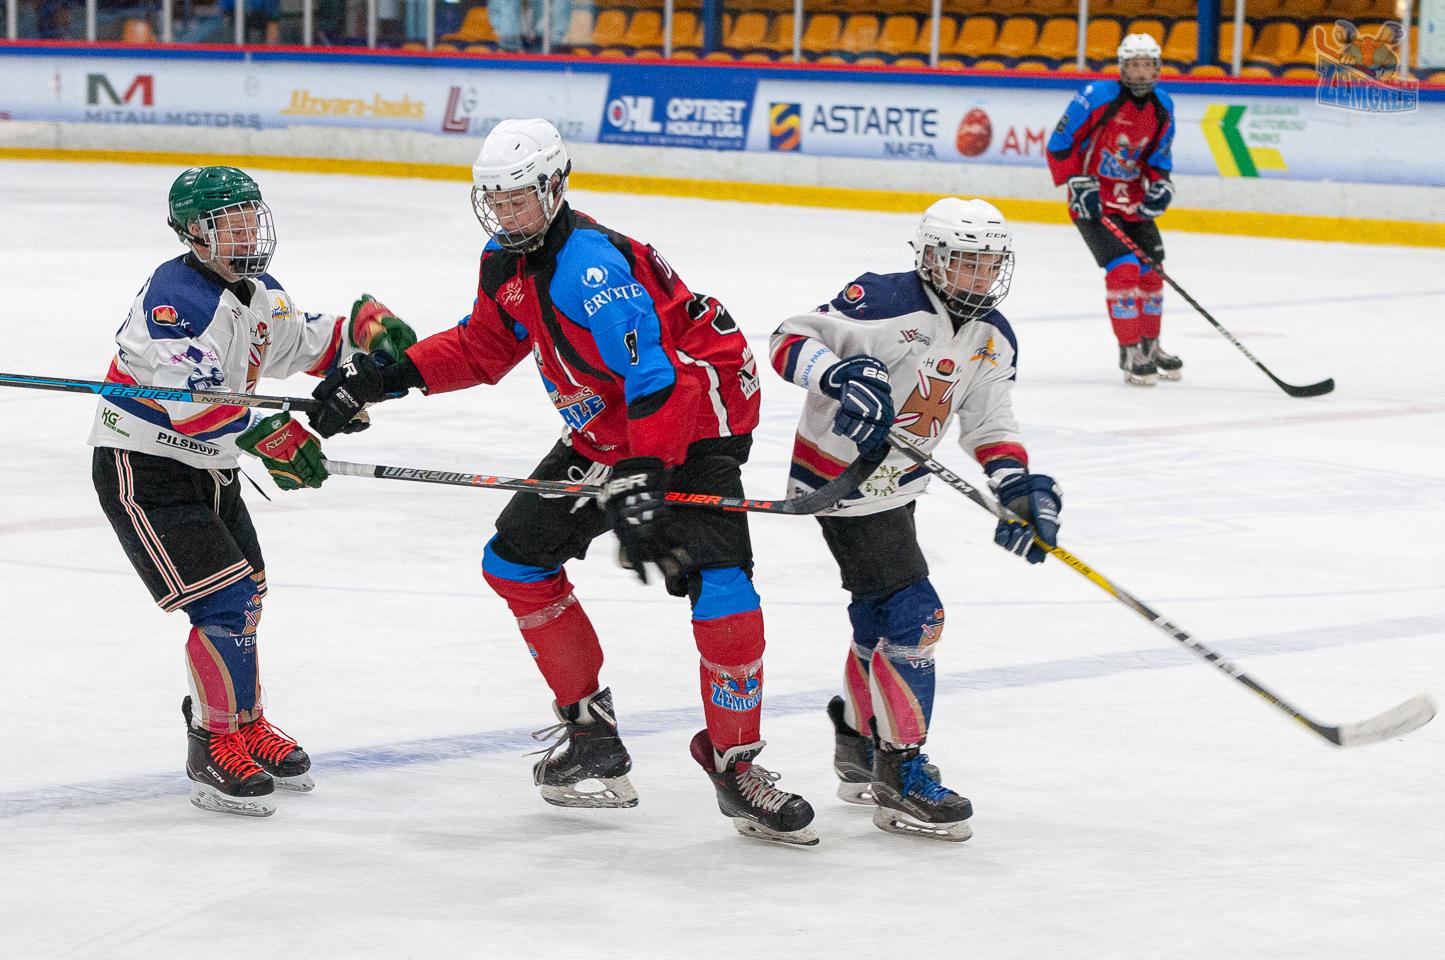 Jelgavas hokeja skola JLSS U17 - Venta 2002 14092019-19